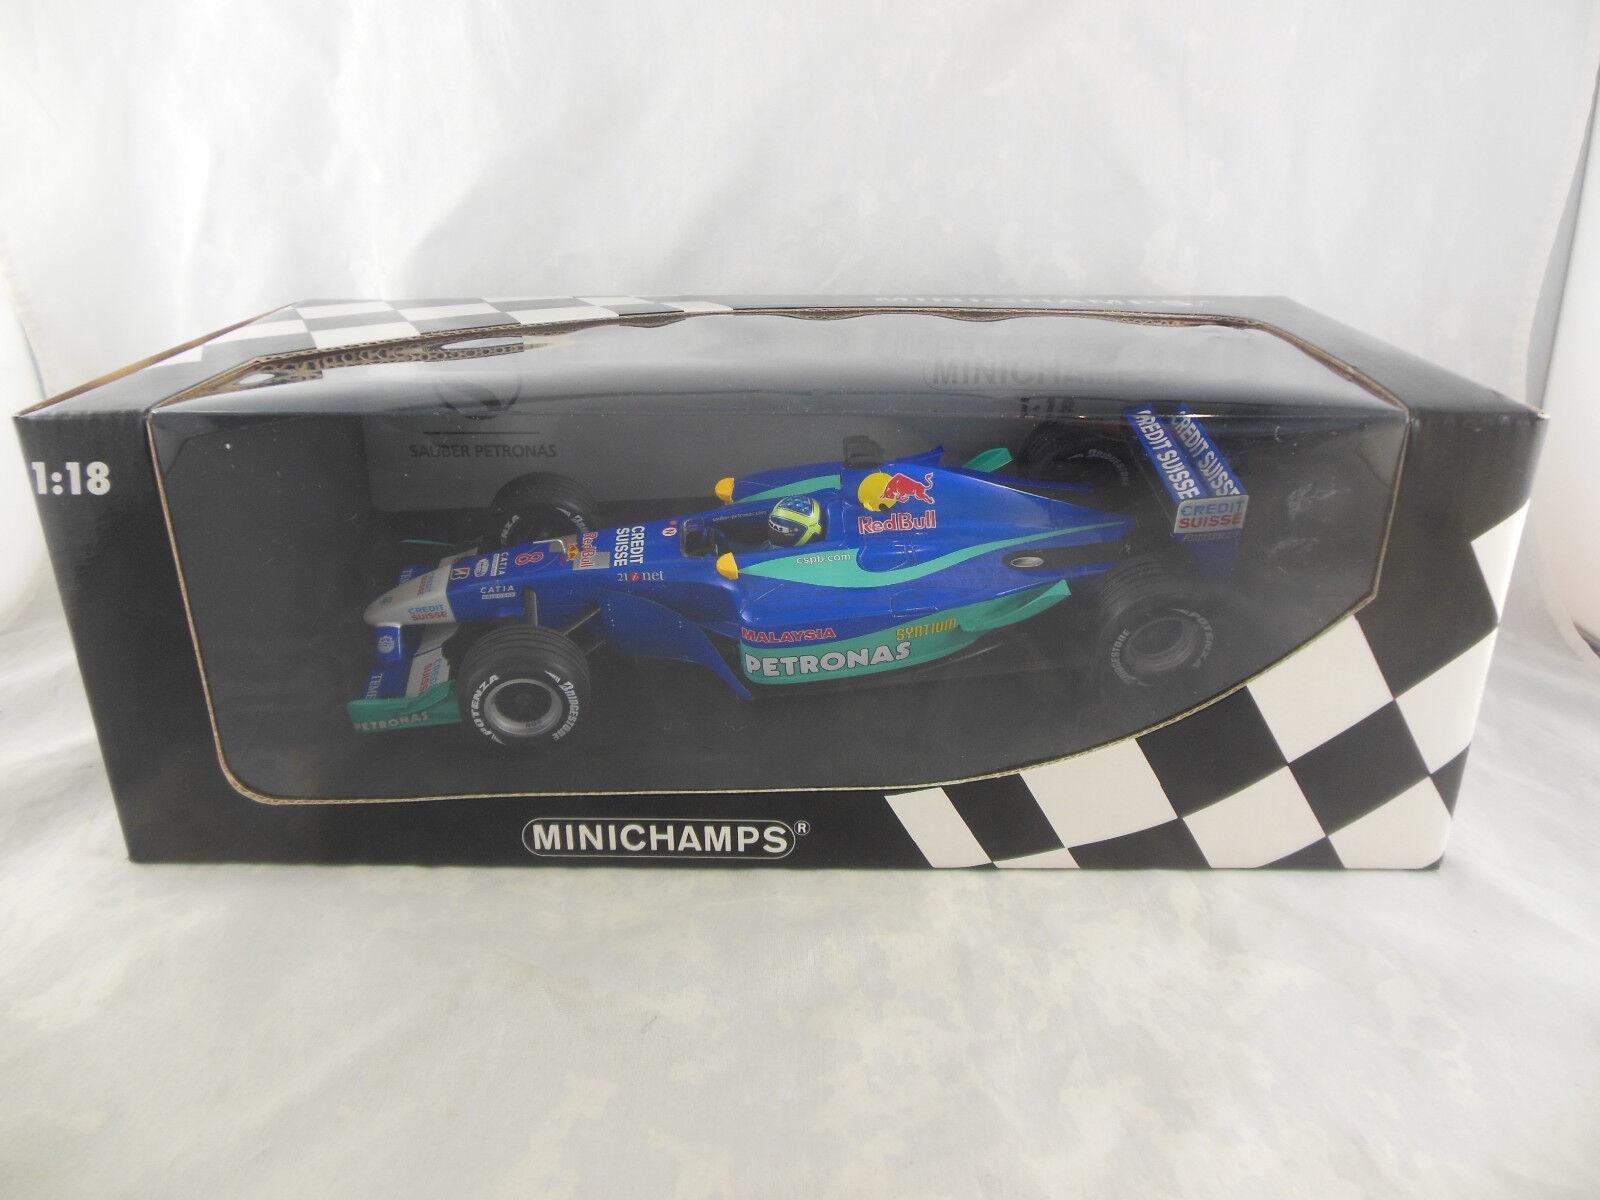 Minichamps 100 020008 Sauber Petronas C21 2002 F Massa   Scale 1 18